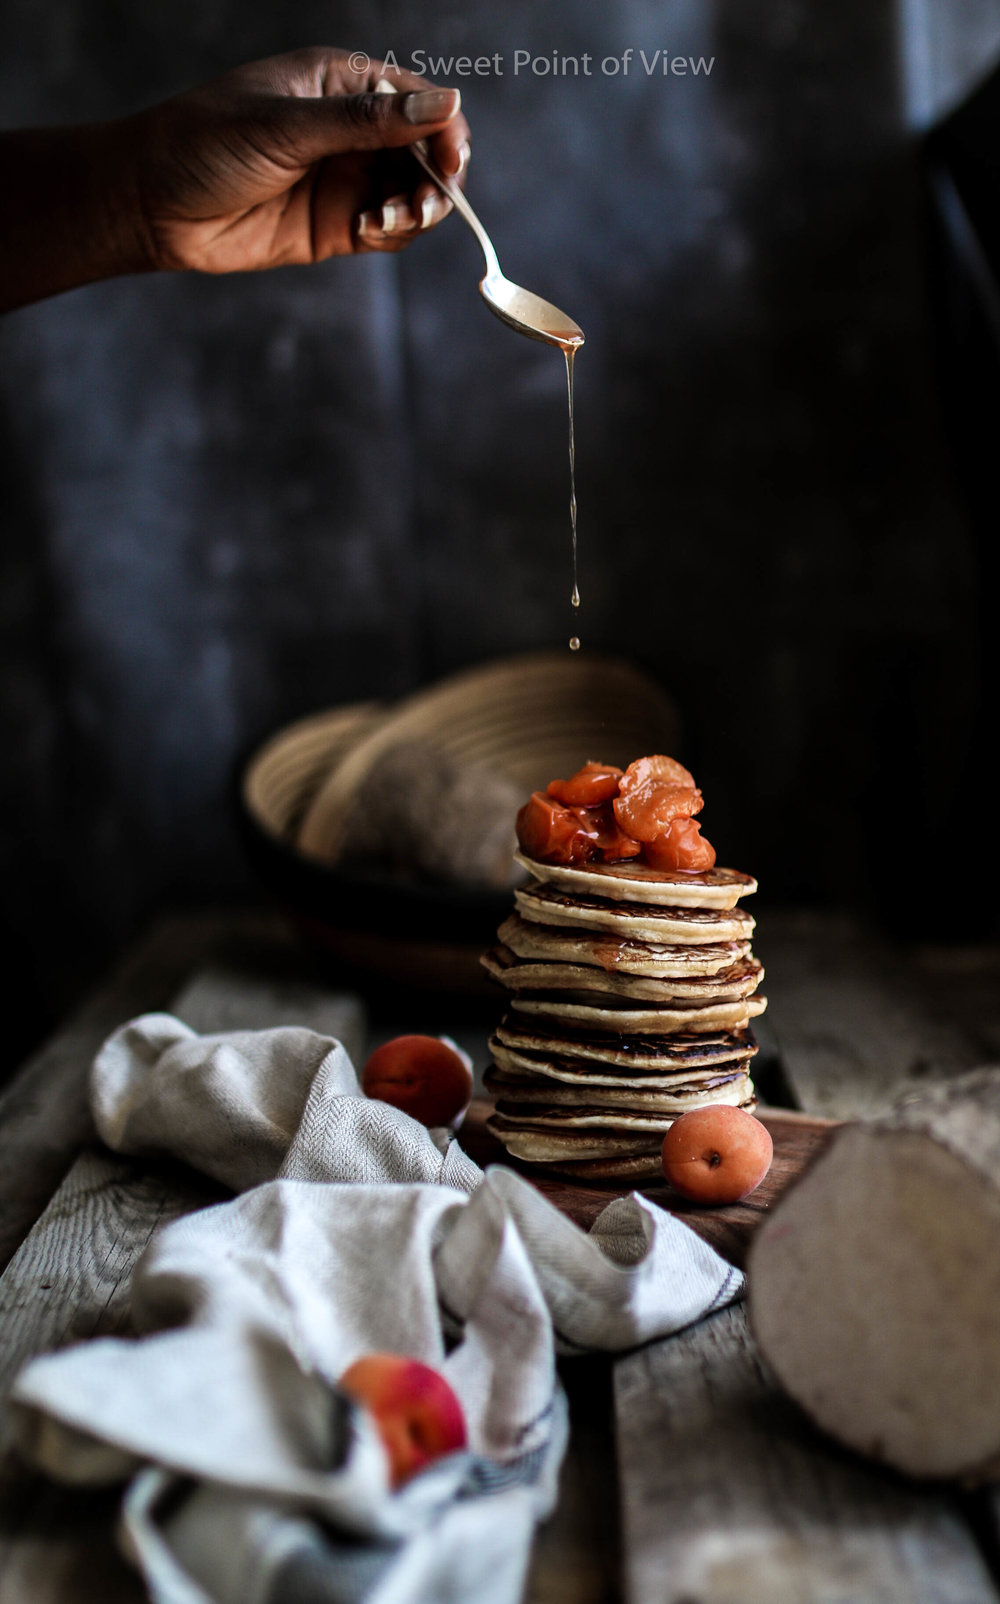 Yam-Flour-Pancakes-Homemade-Apricot-Yam-9-of-1.jpg